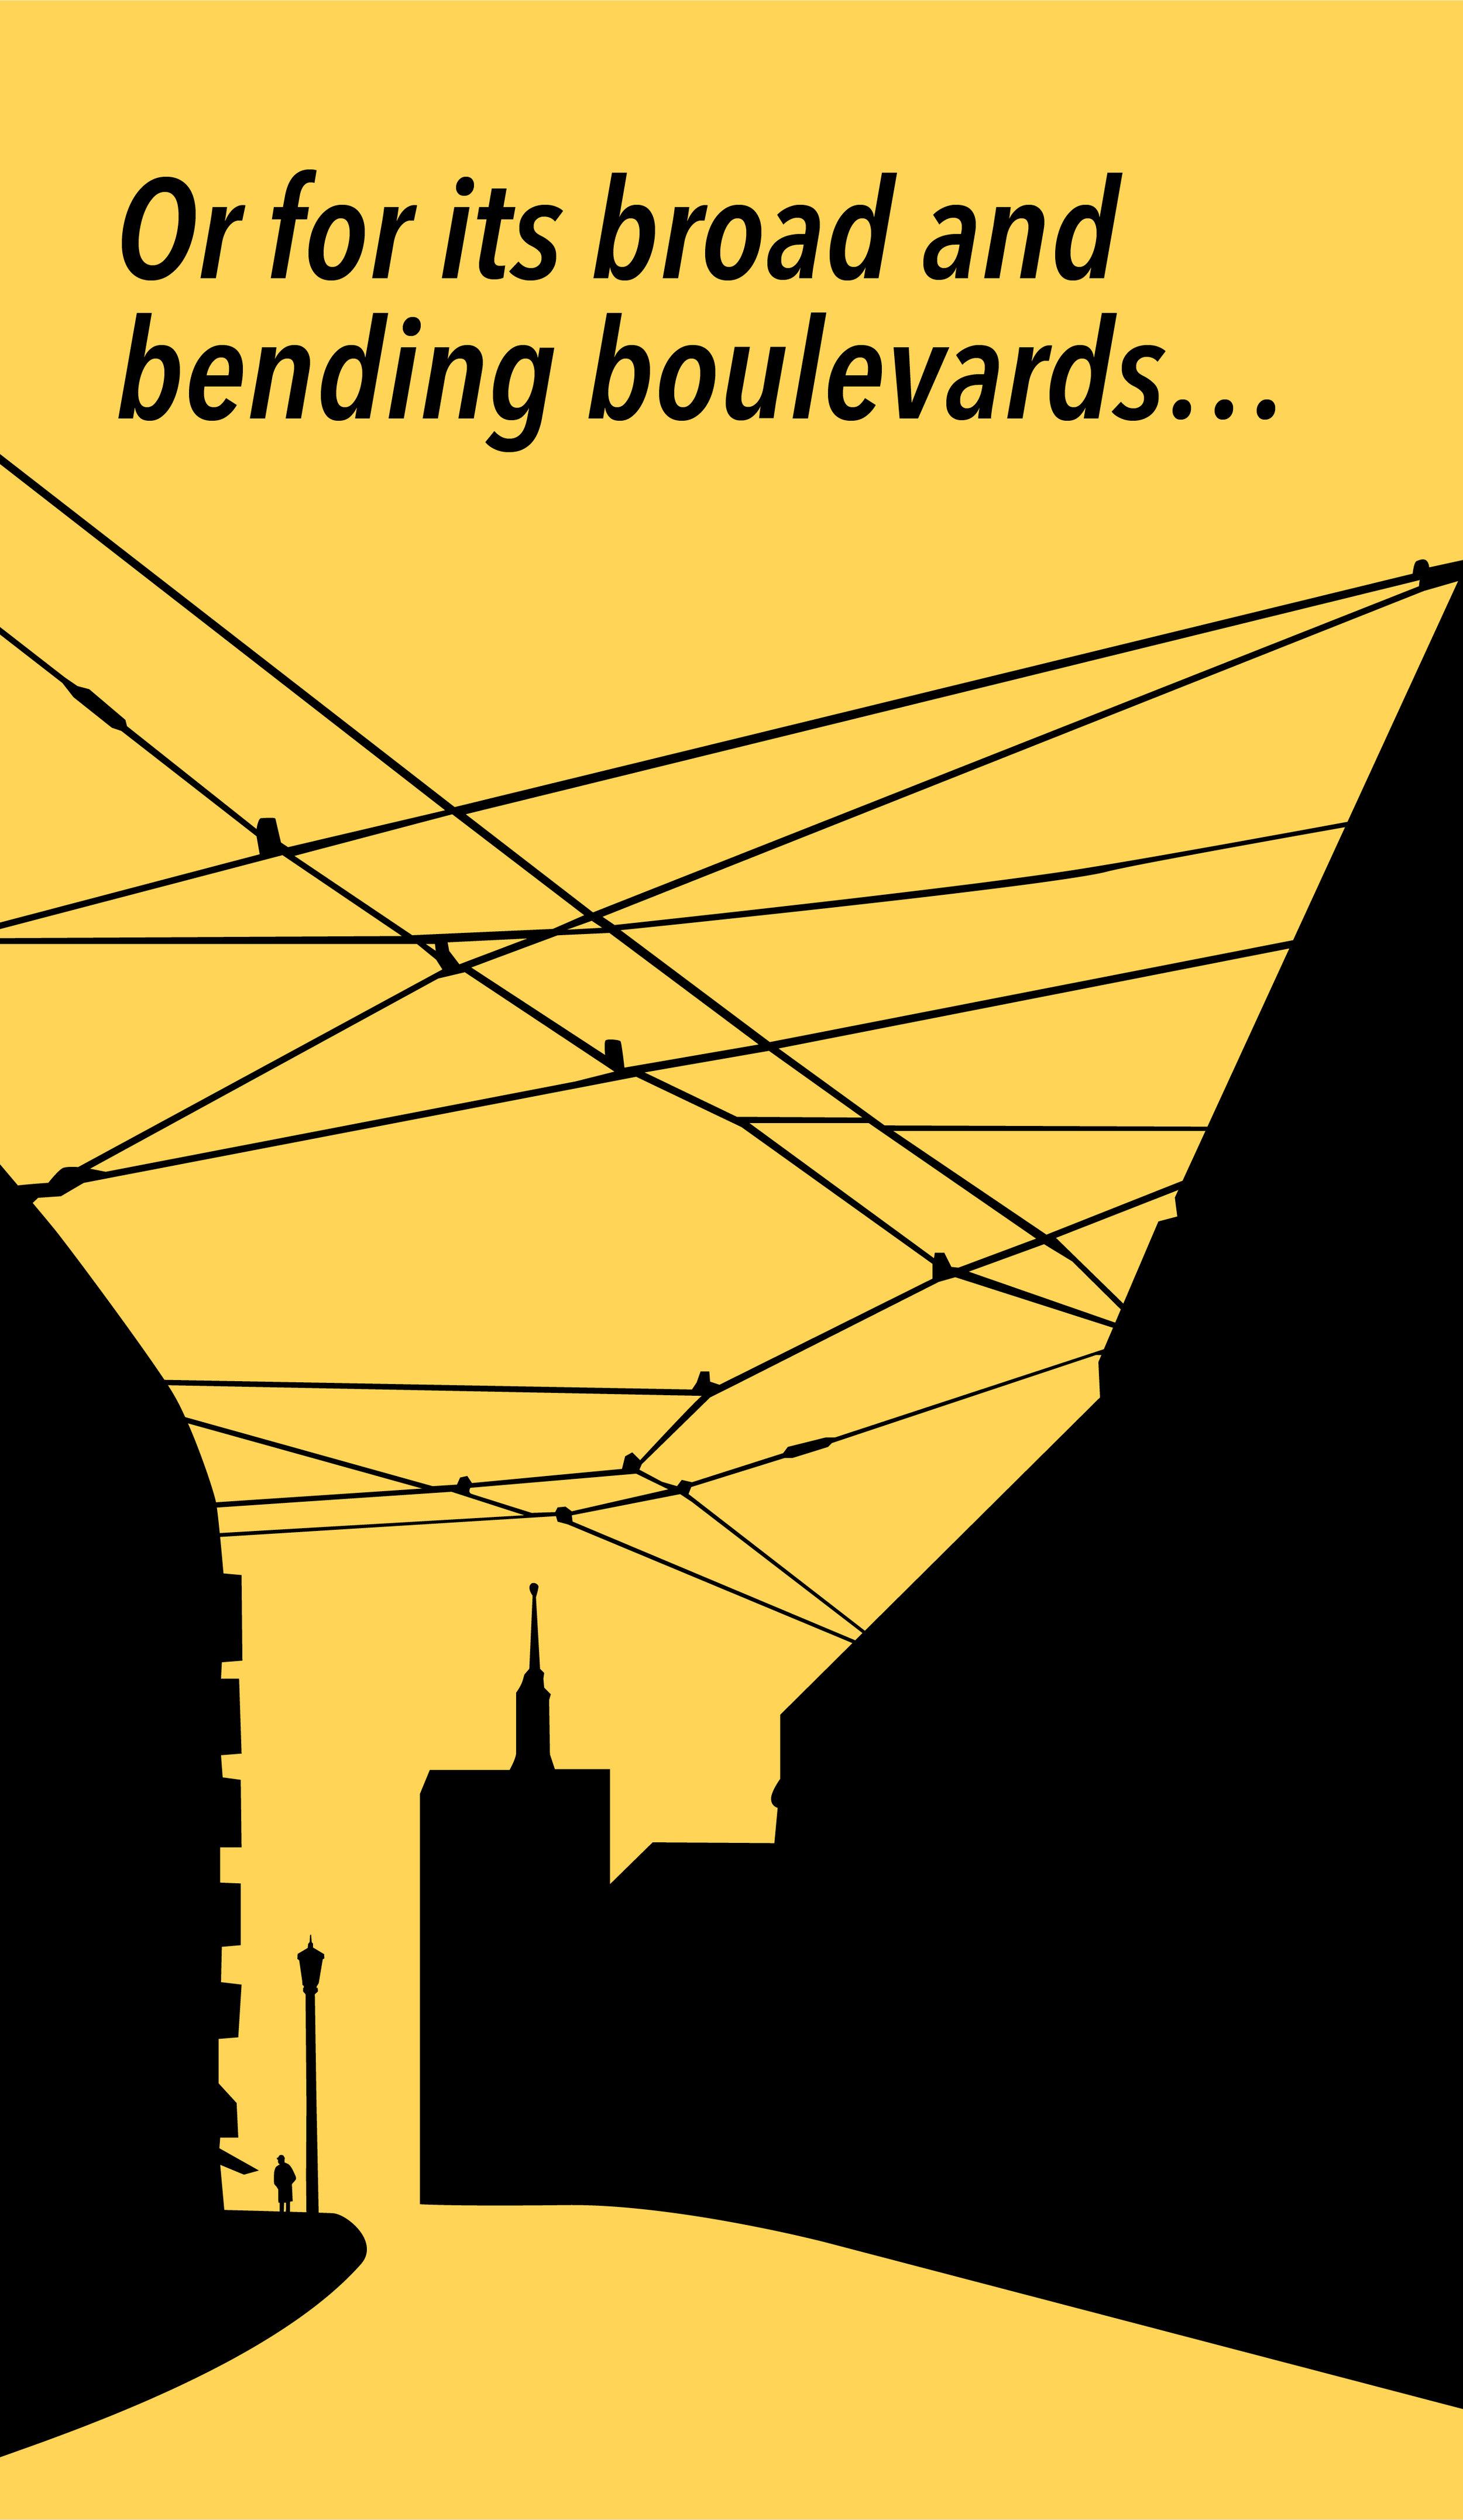 City On The Make - Storyboard - 01.25.1718.jpg